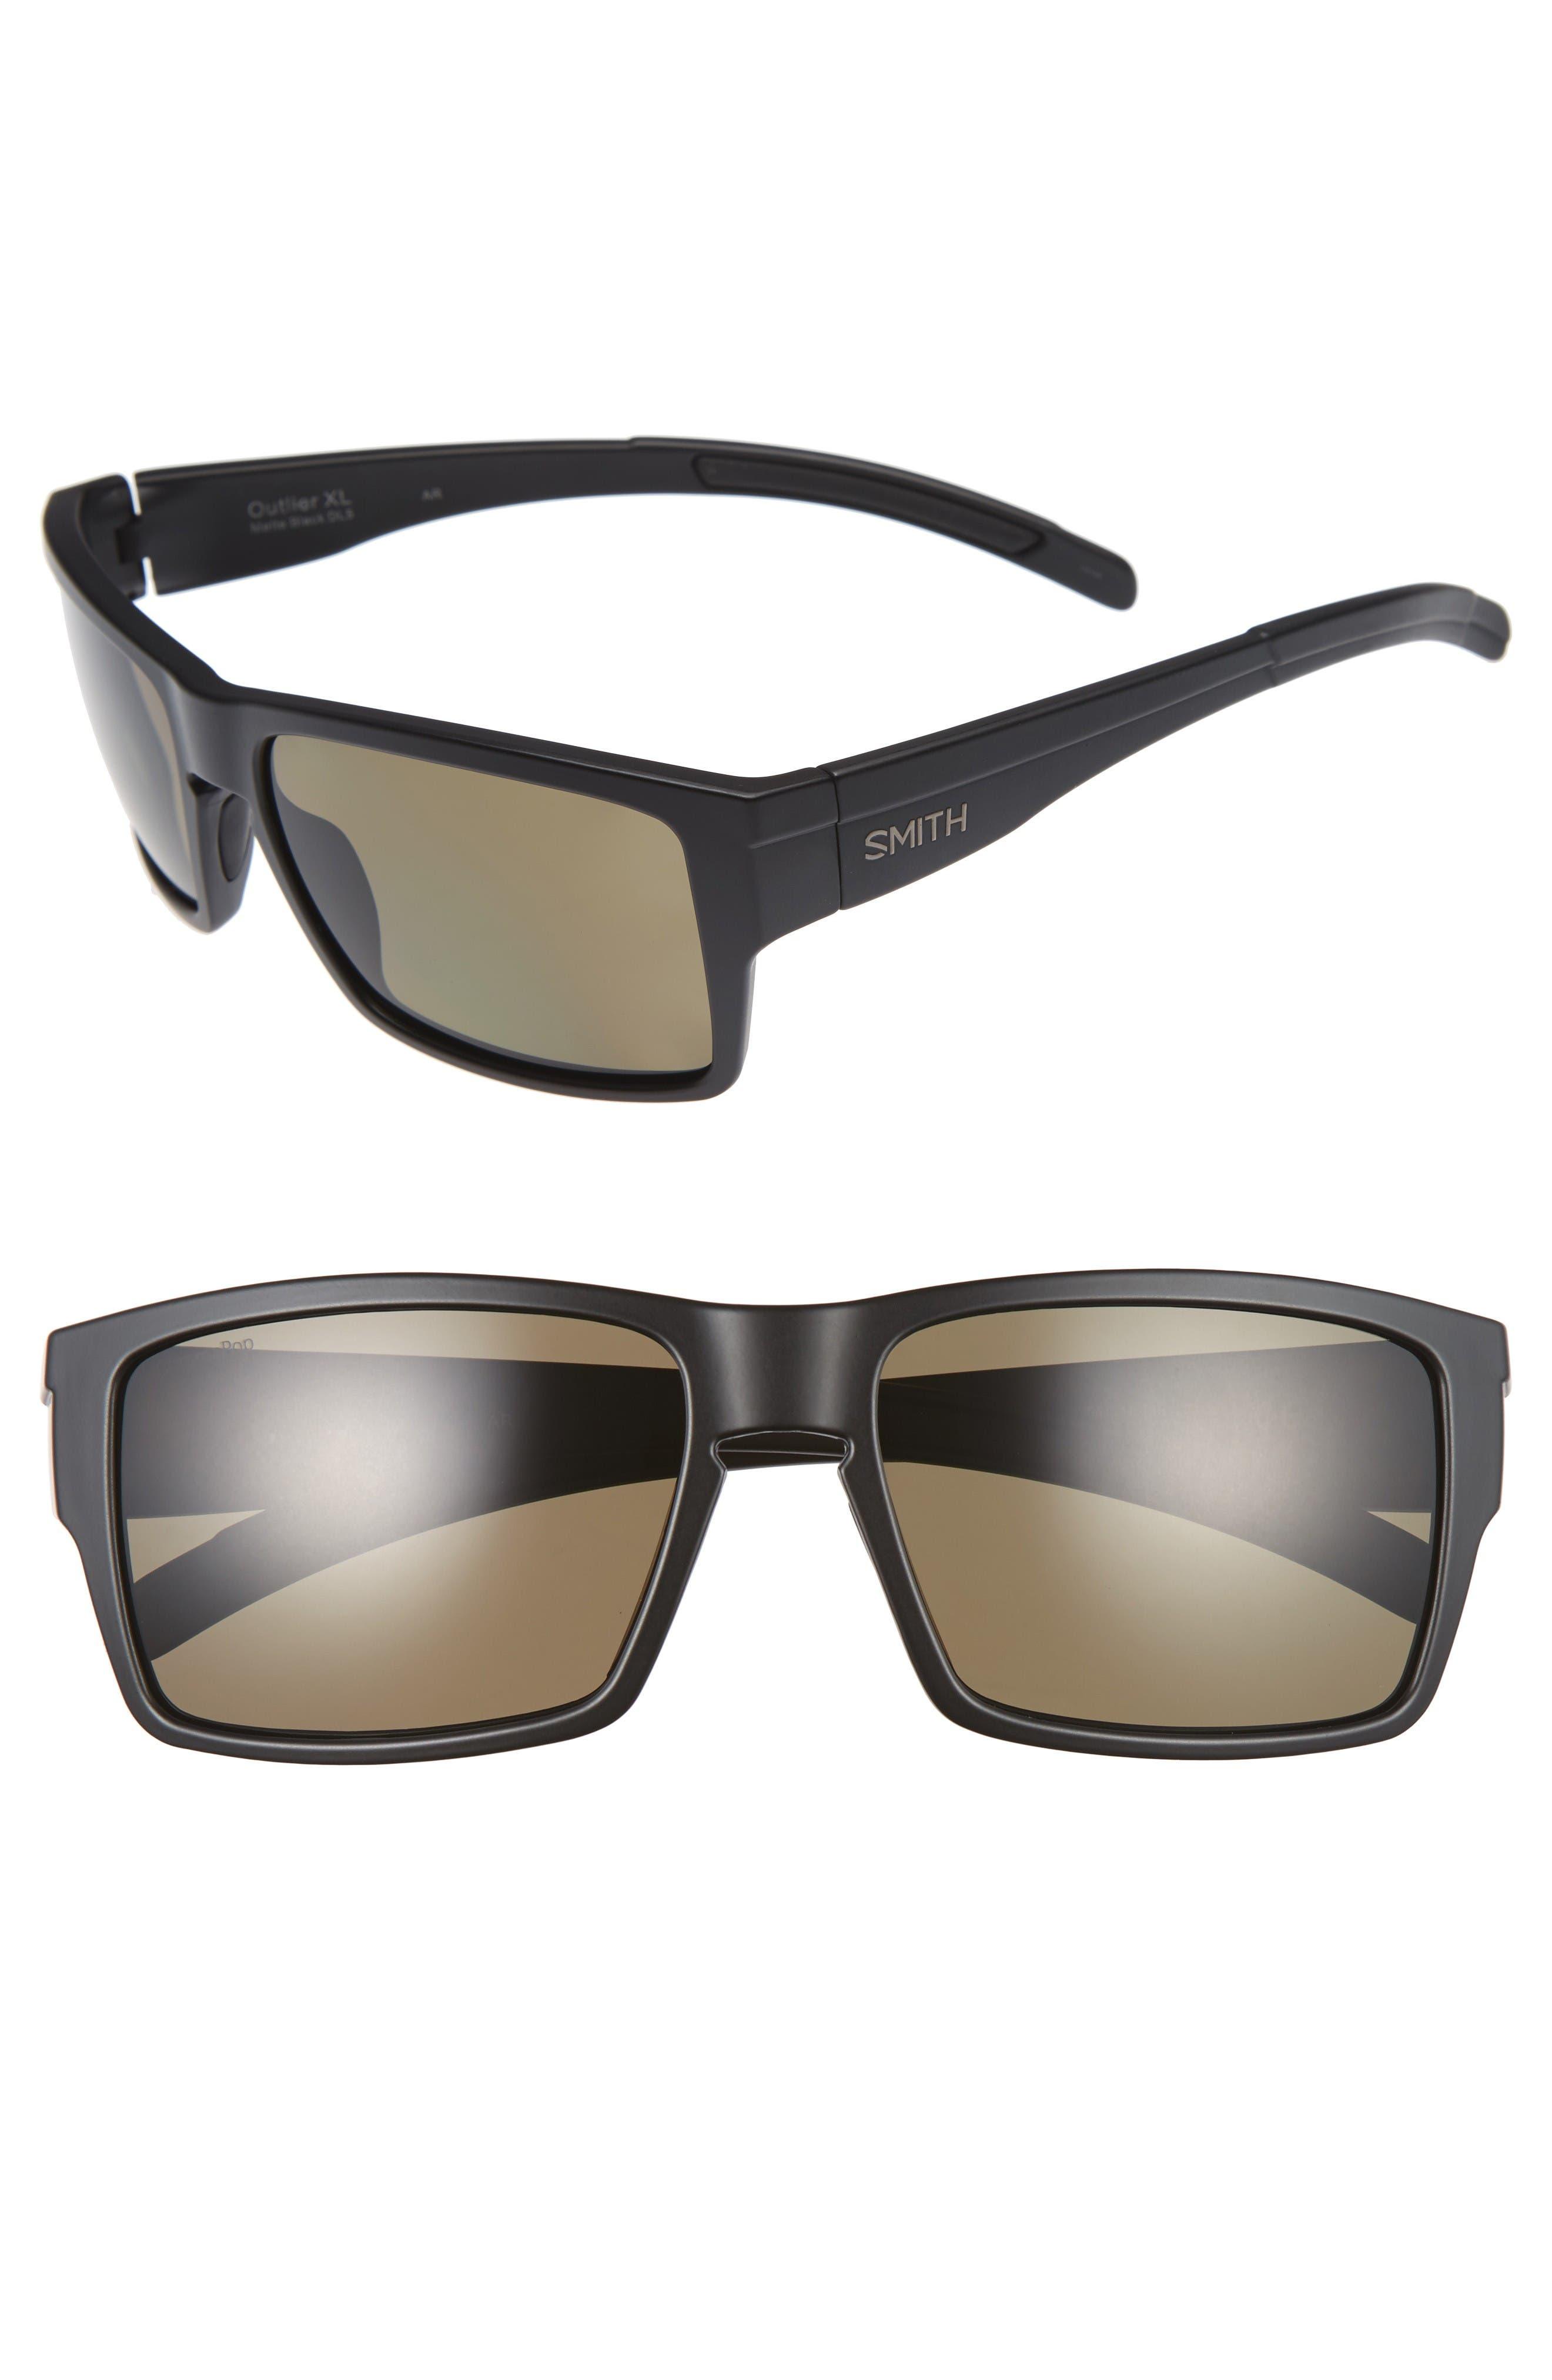 8db709e72f Smith Outlier Xl 58Mm Polarized Sunglasses - Matte Black